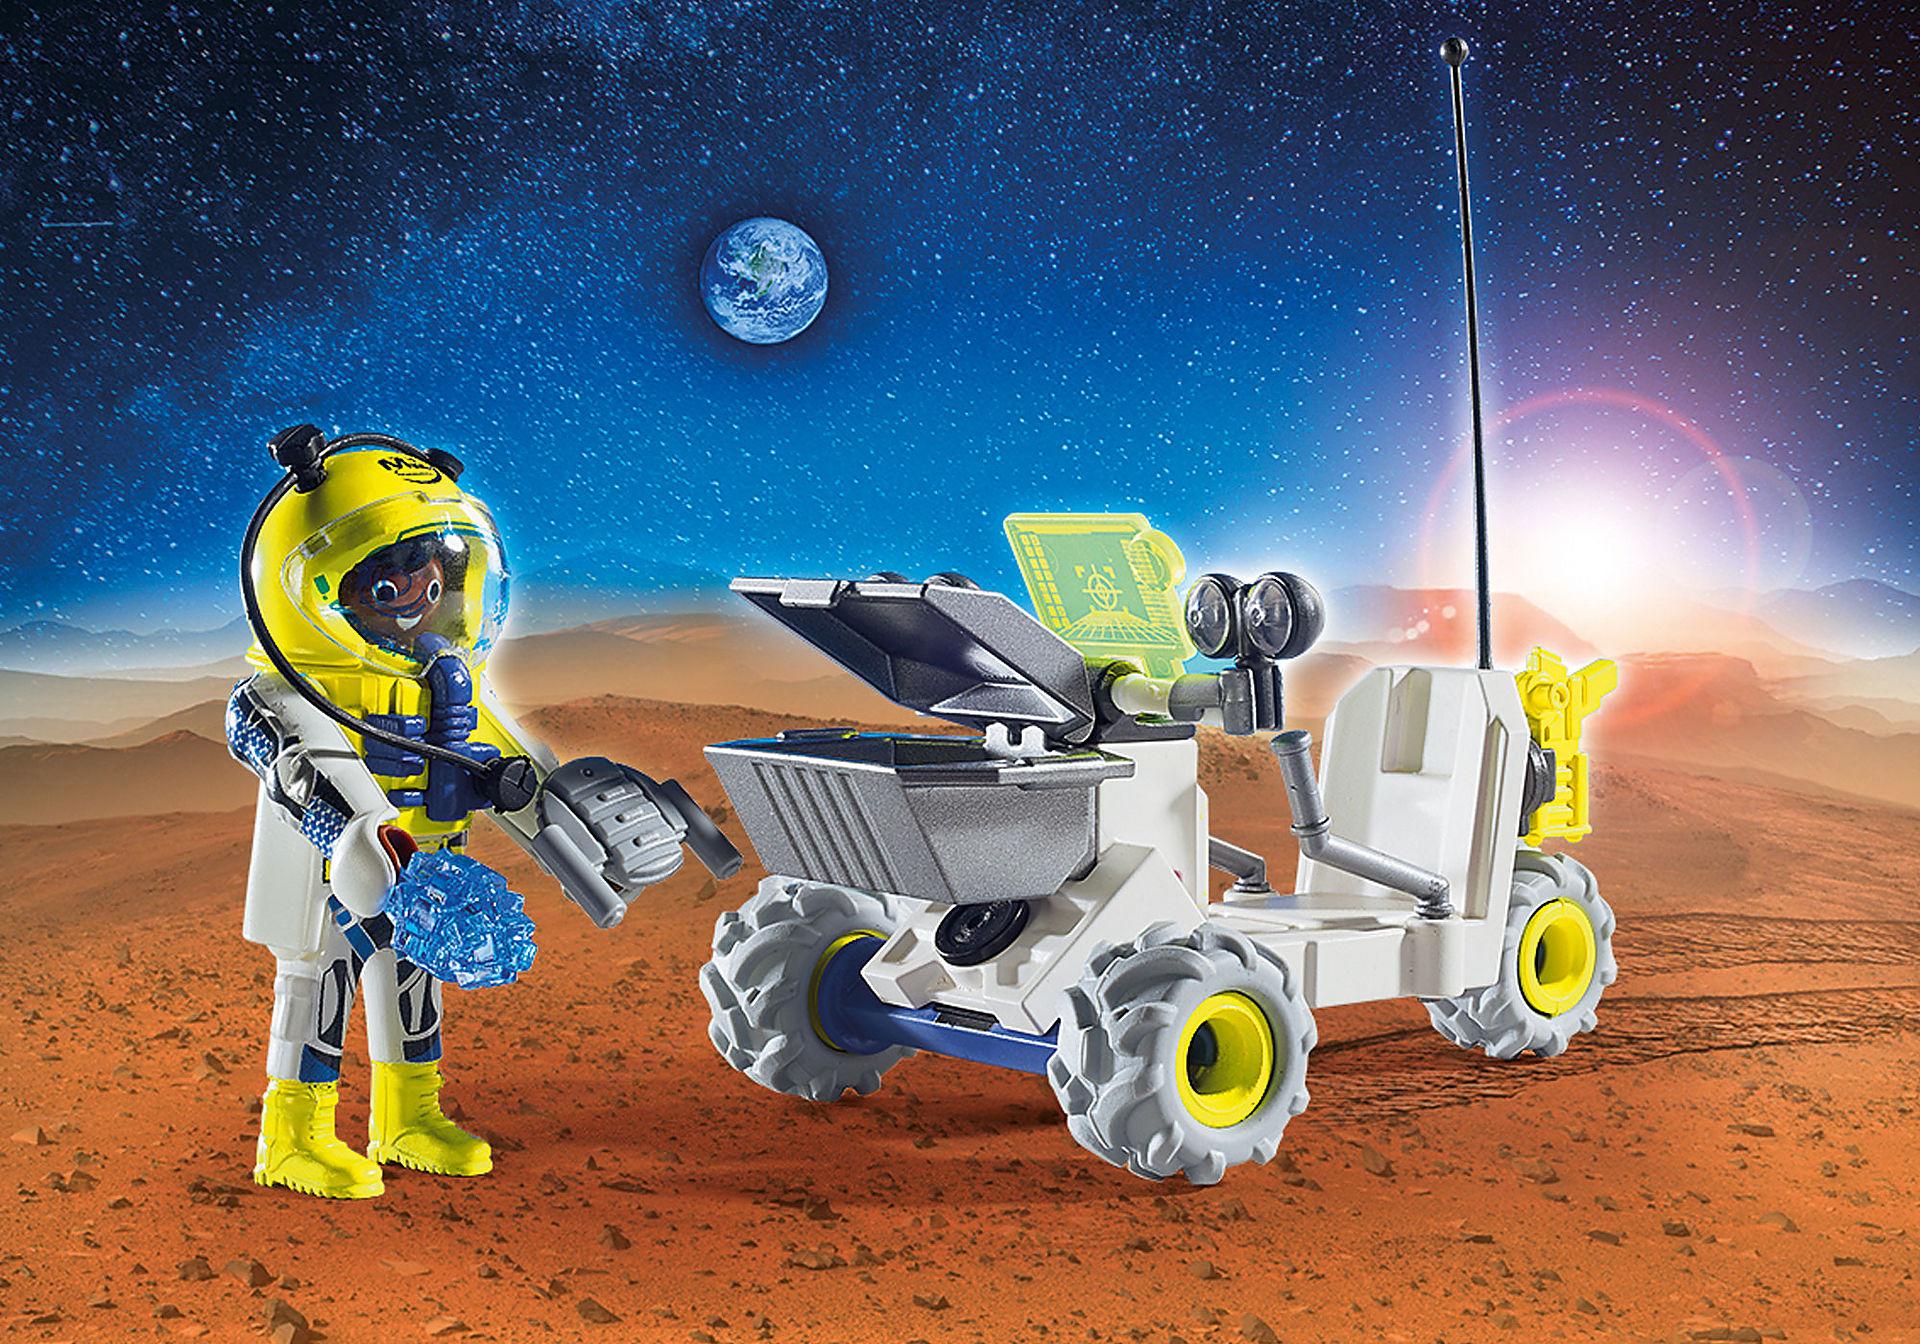 http://media.playmobil.com/i/playmobil/9491_product_extra1/Mars trike